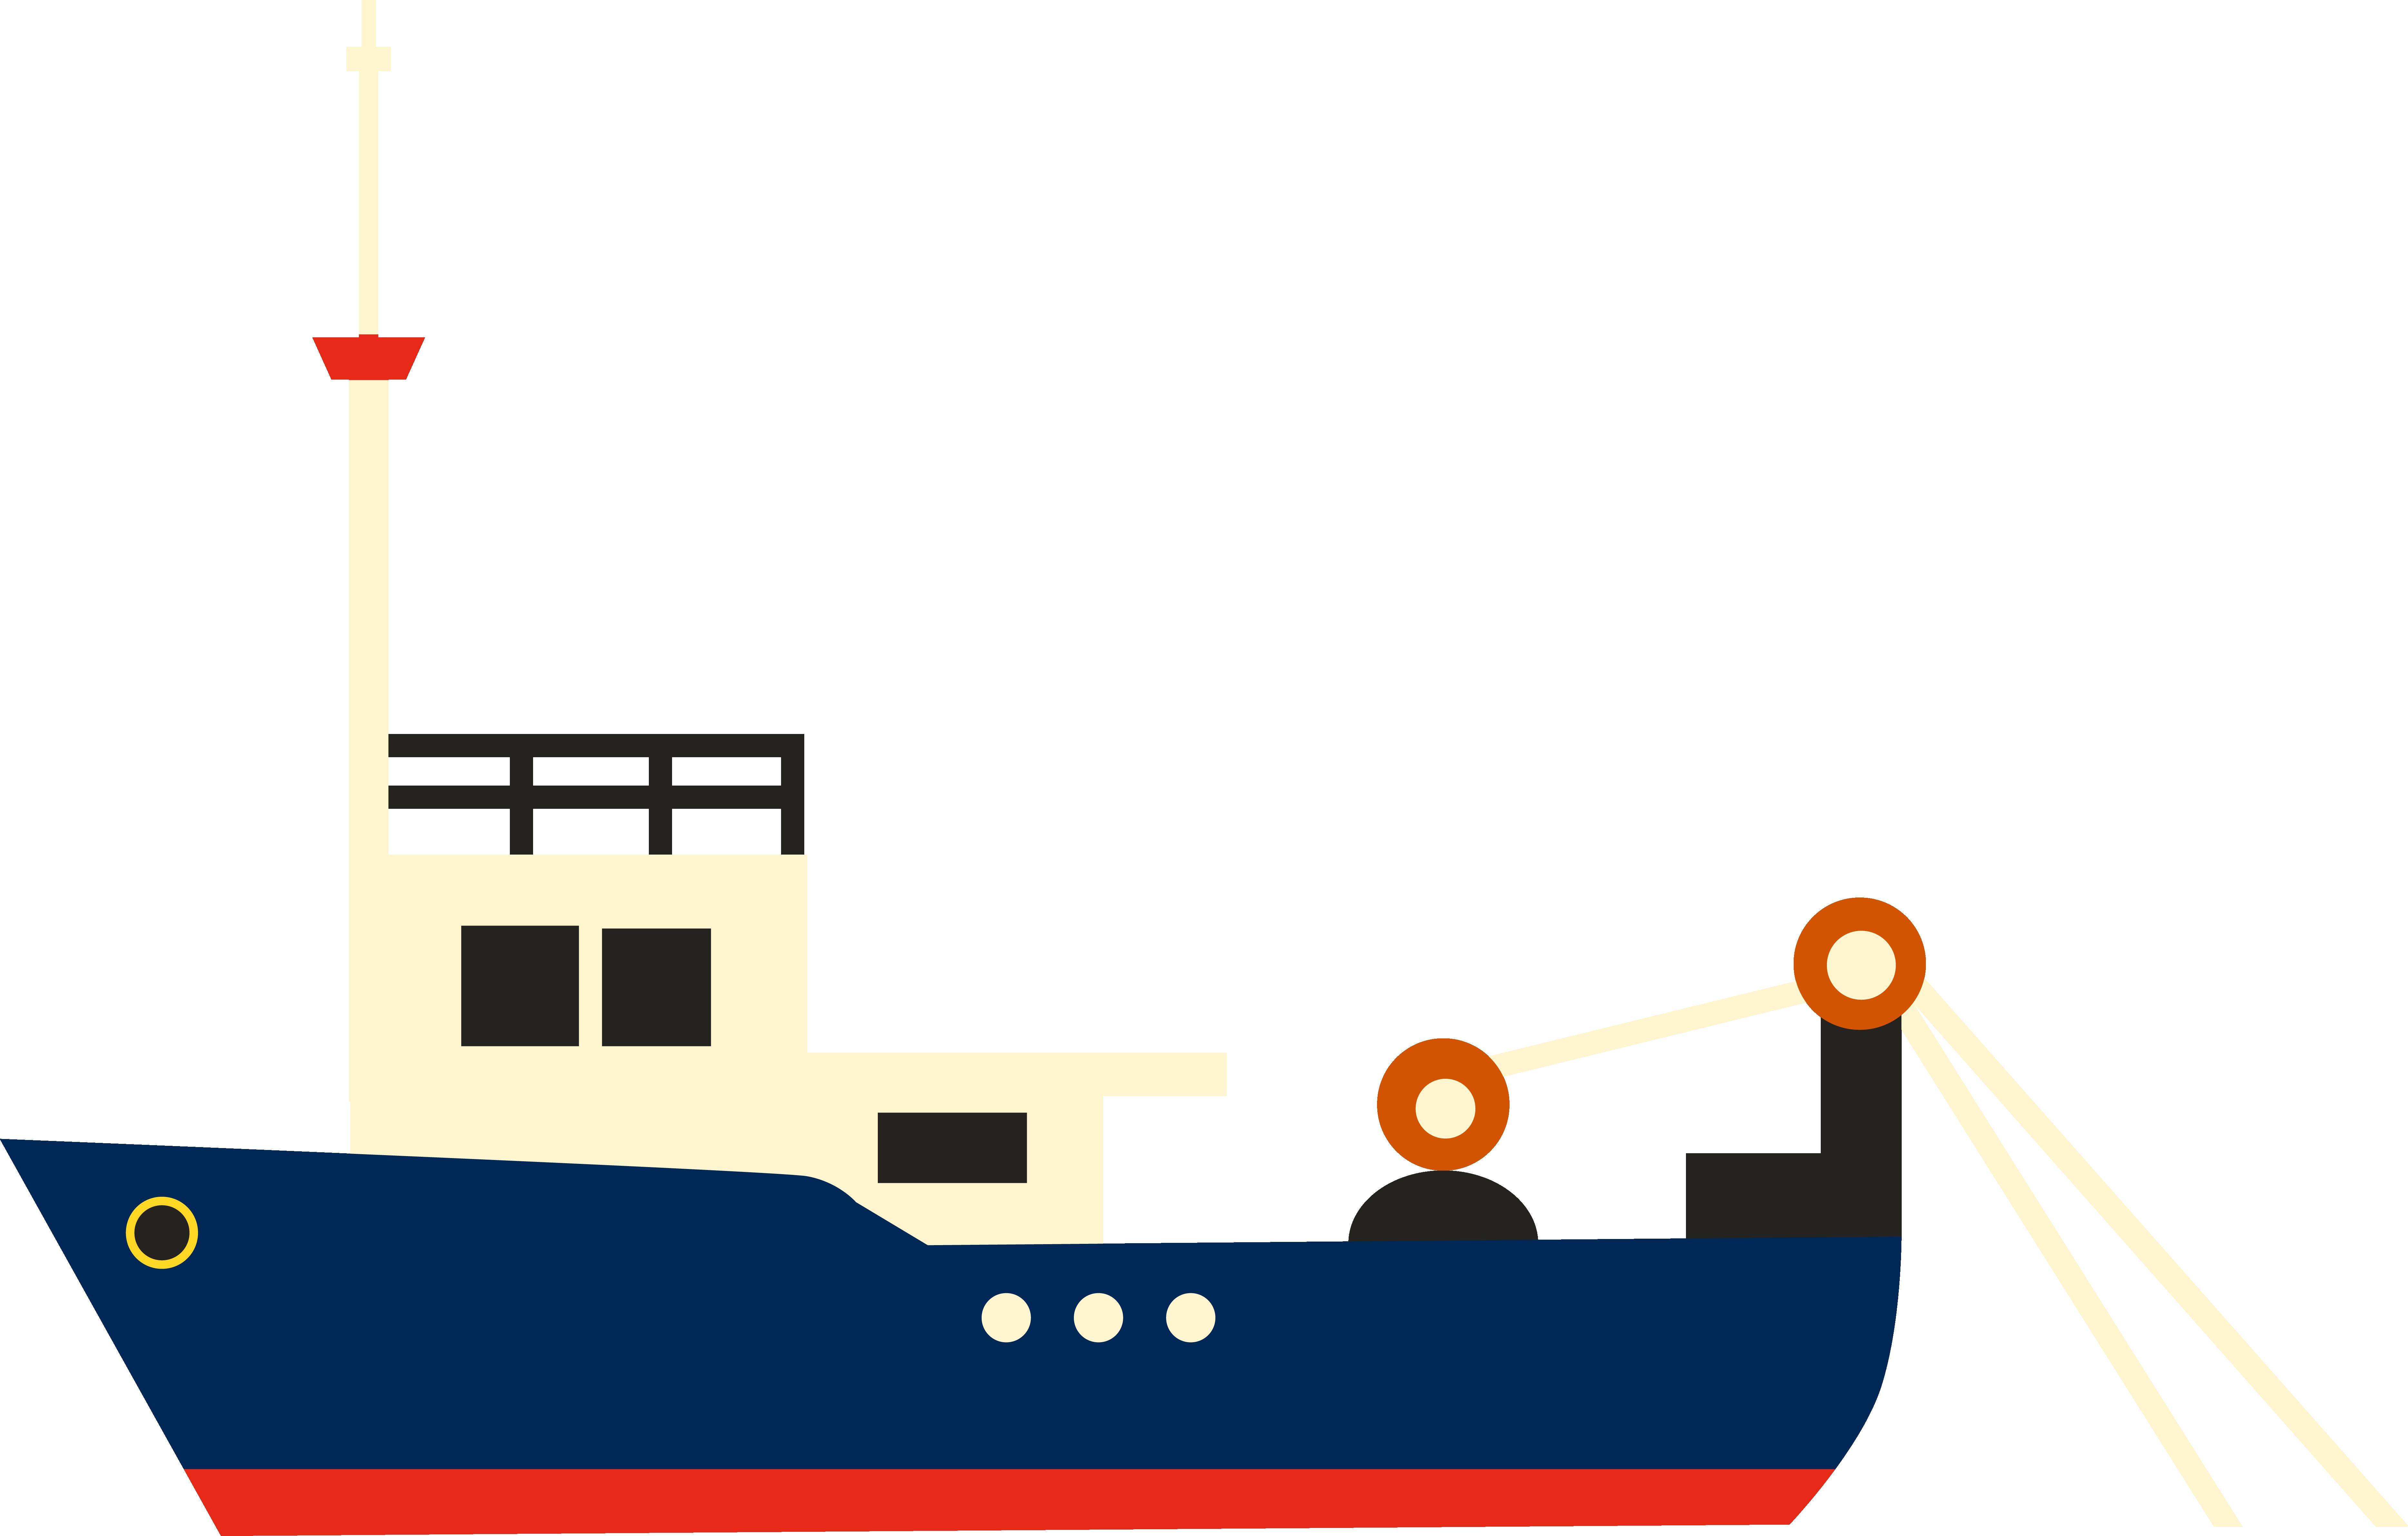 Cargo ship watercraft cartoon. Navy clipart warship